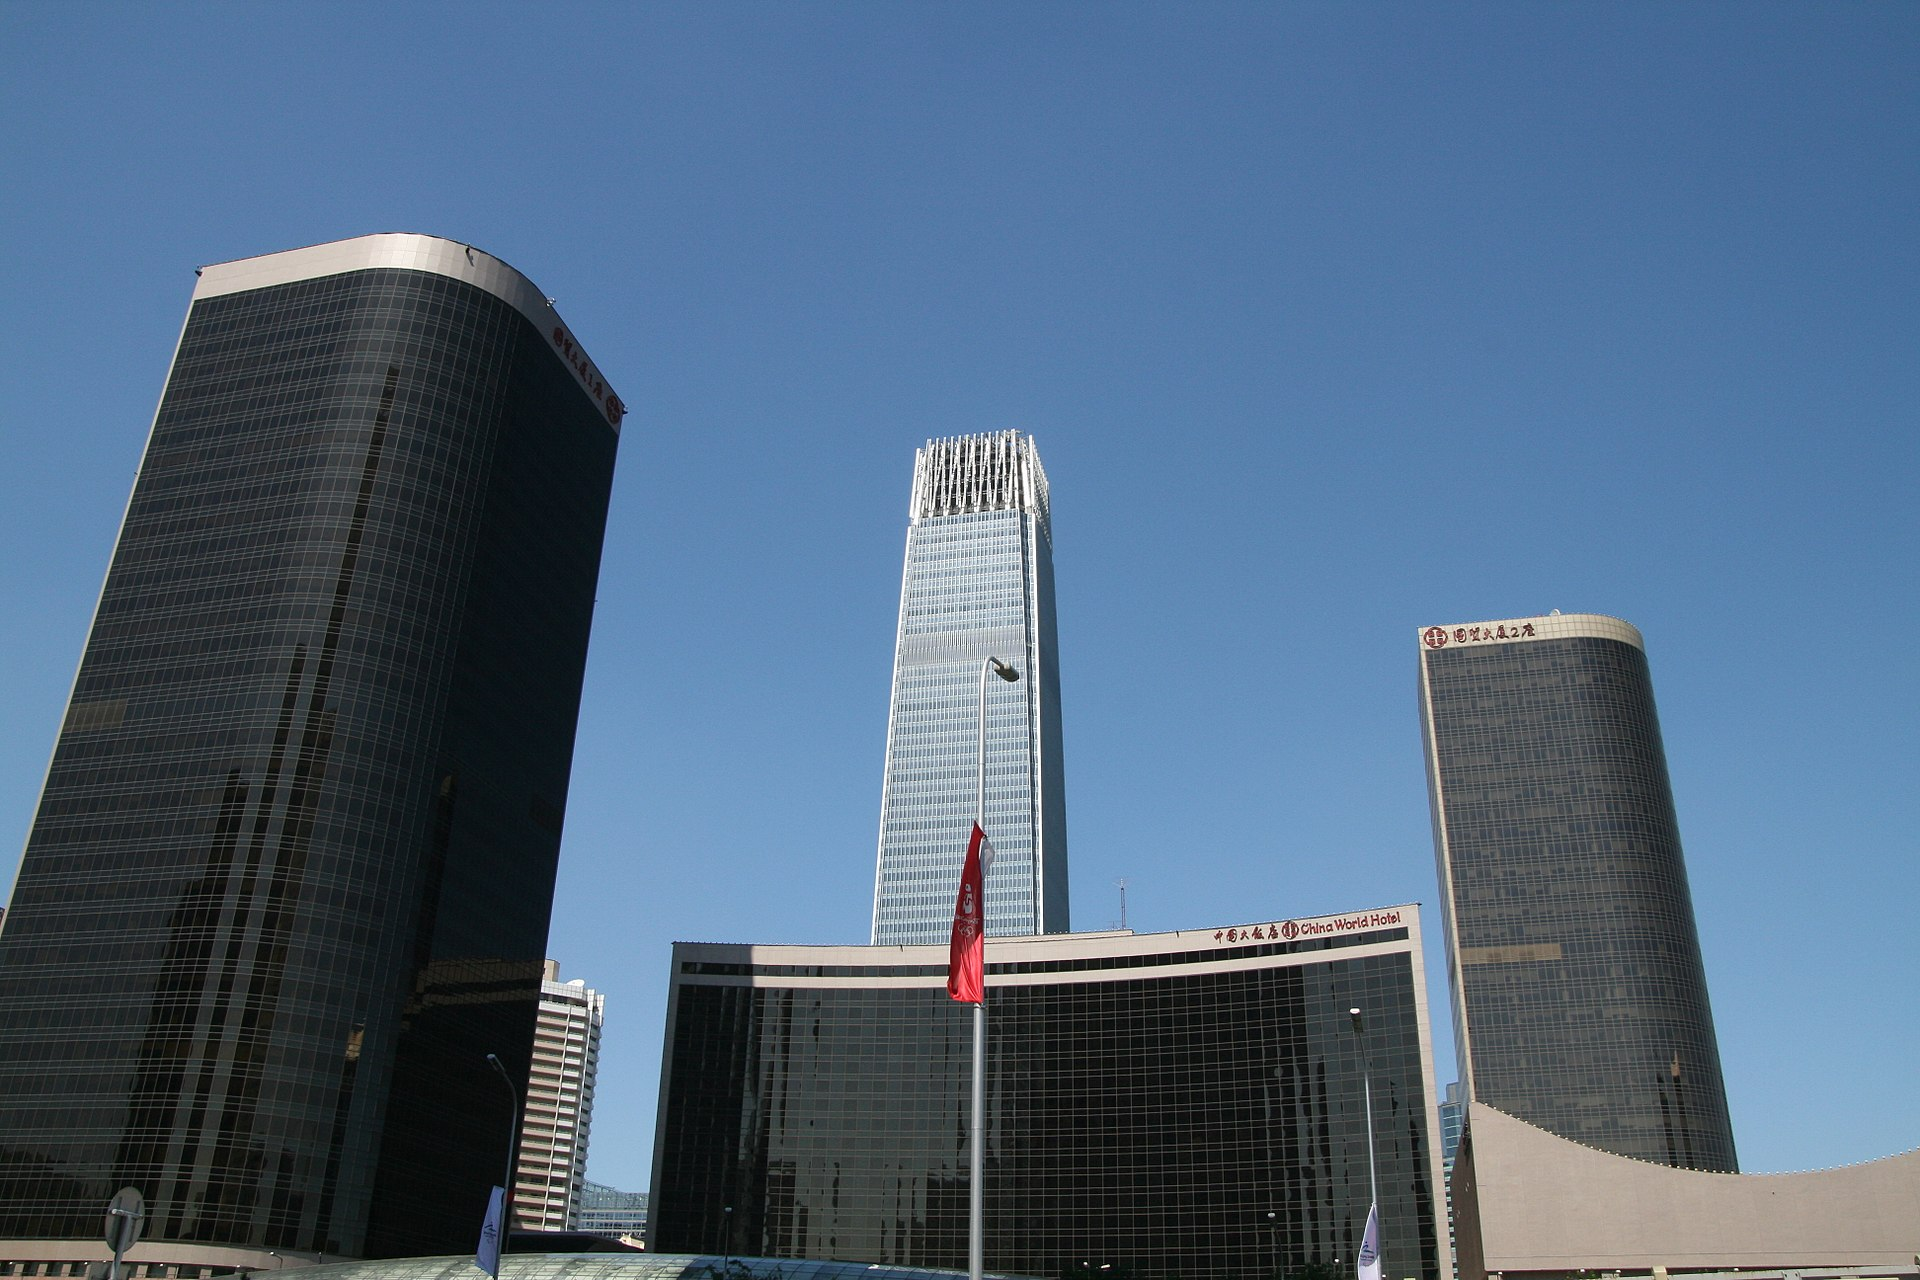 The China World Trade Center Wikipedia